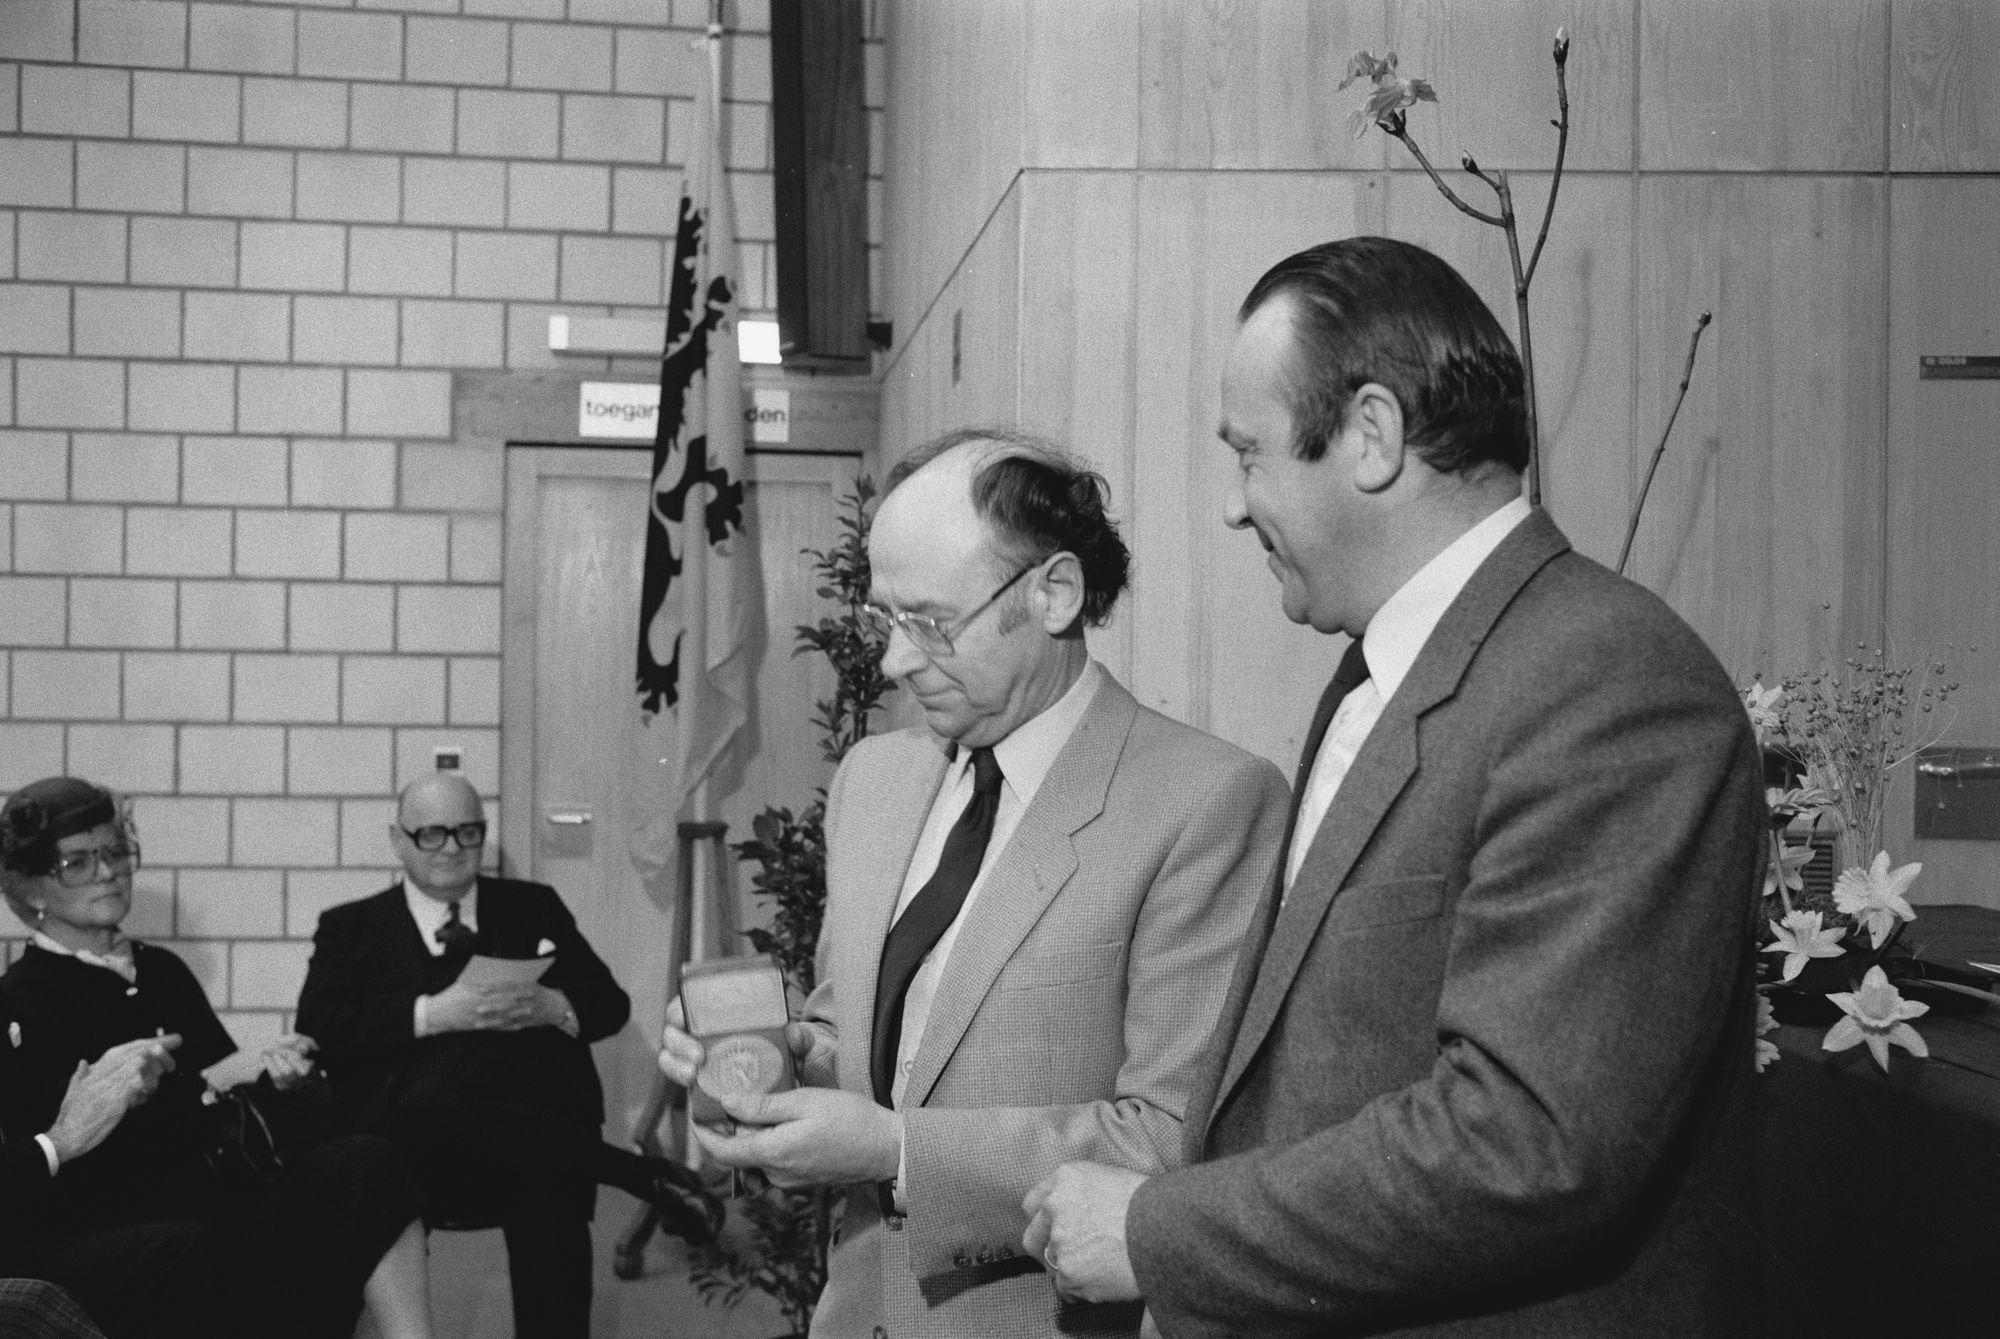 Inhuldiging van het Vlasmuseum 1982